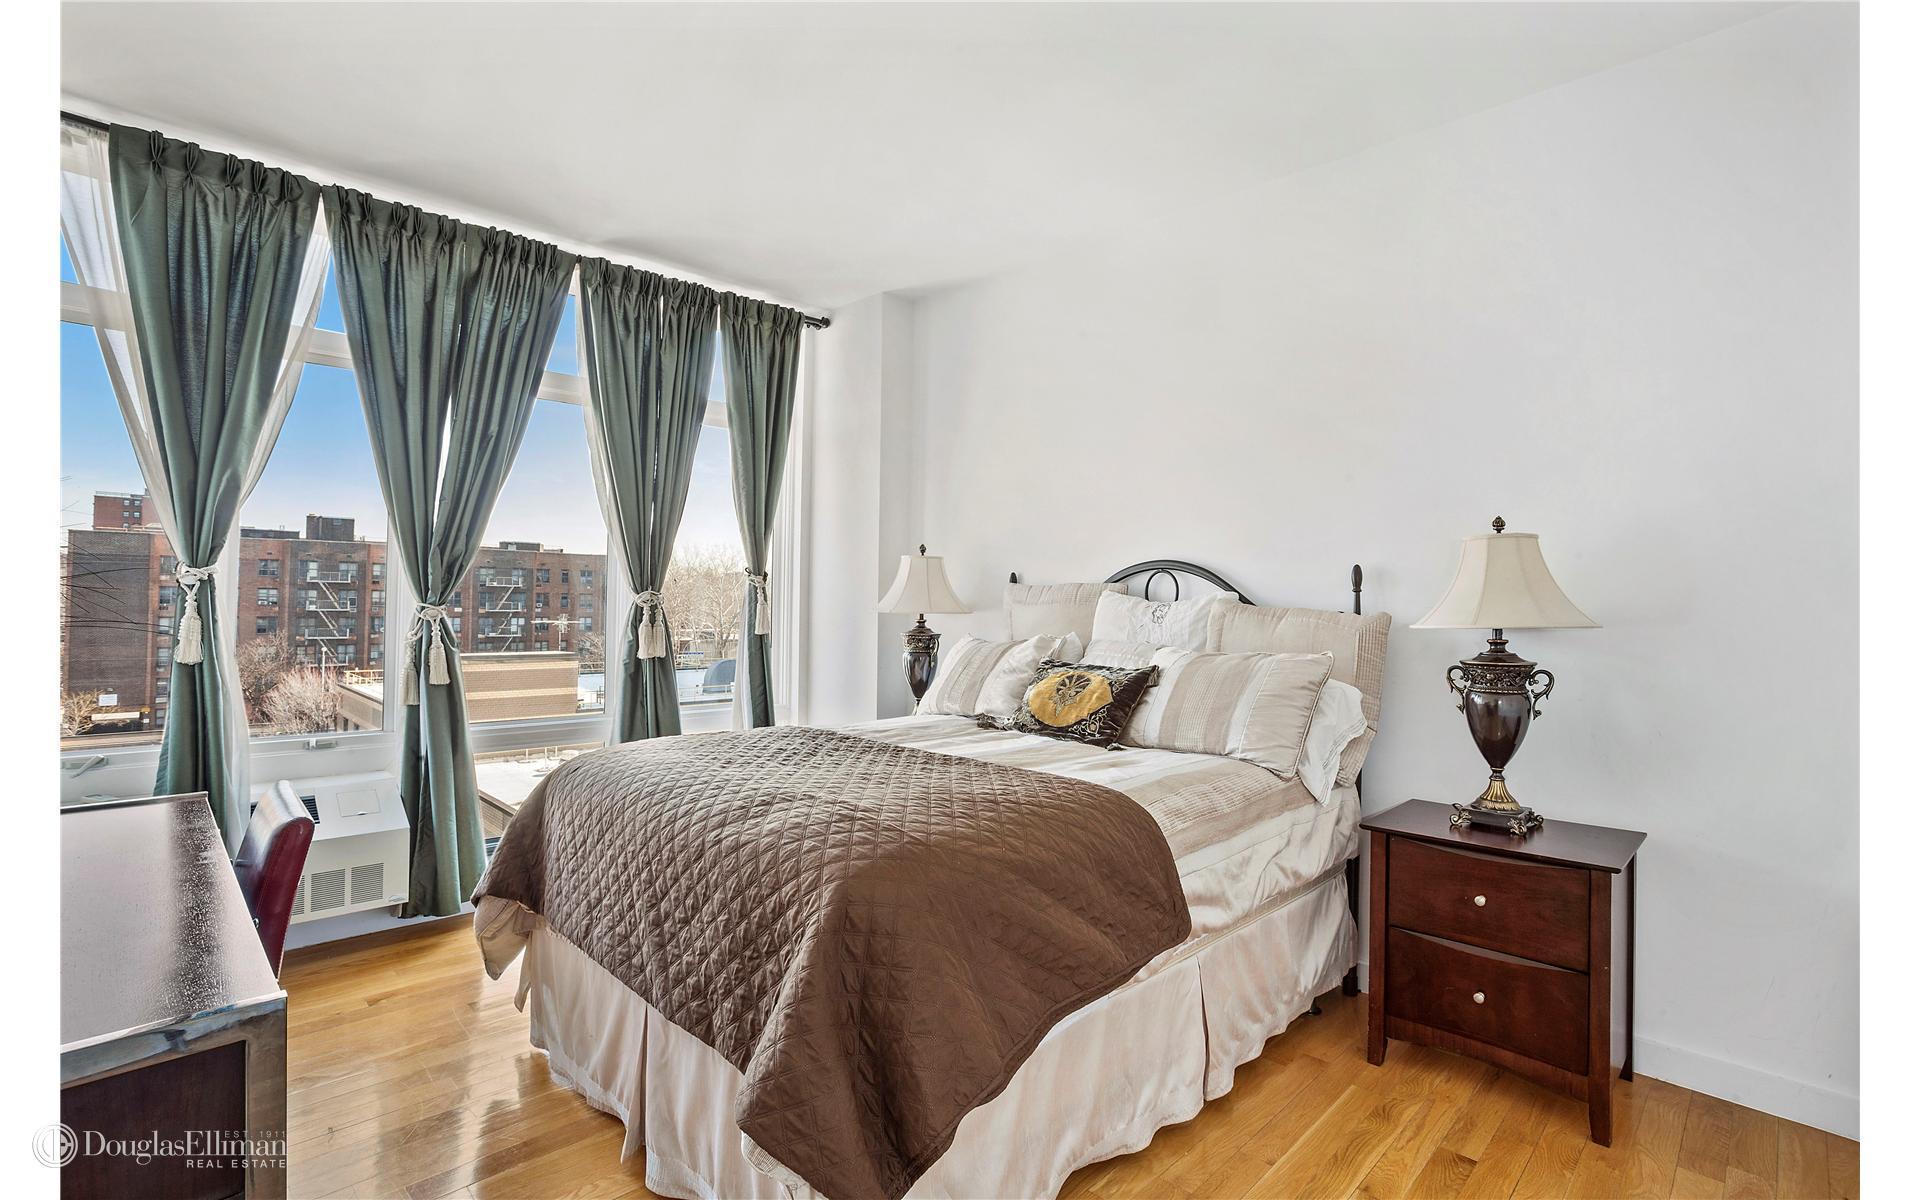 3 Bedroom Homes For Rent Norfolk Va